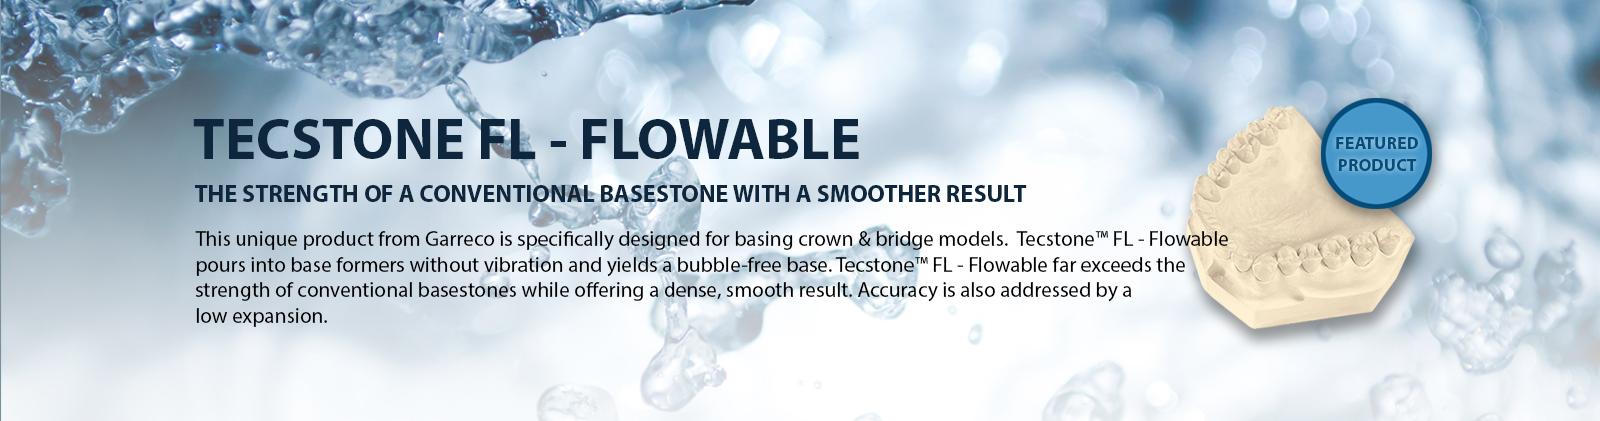 Tecstone-Flowable-Slideshow-Banner2-2